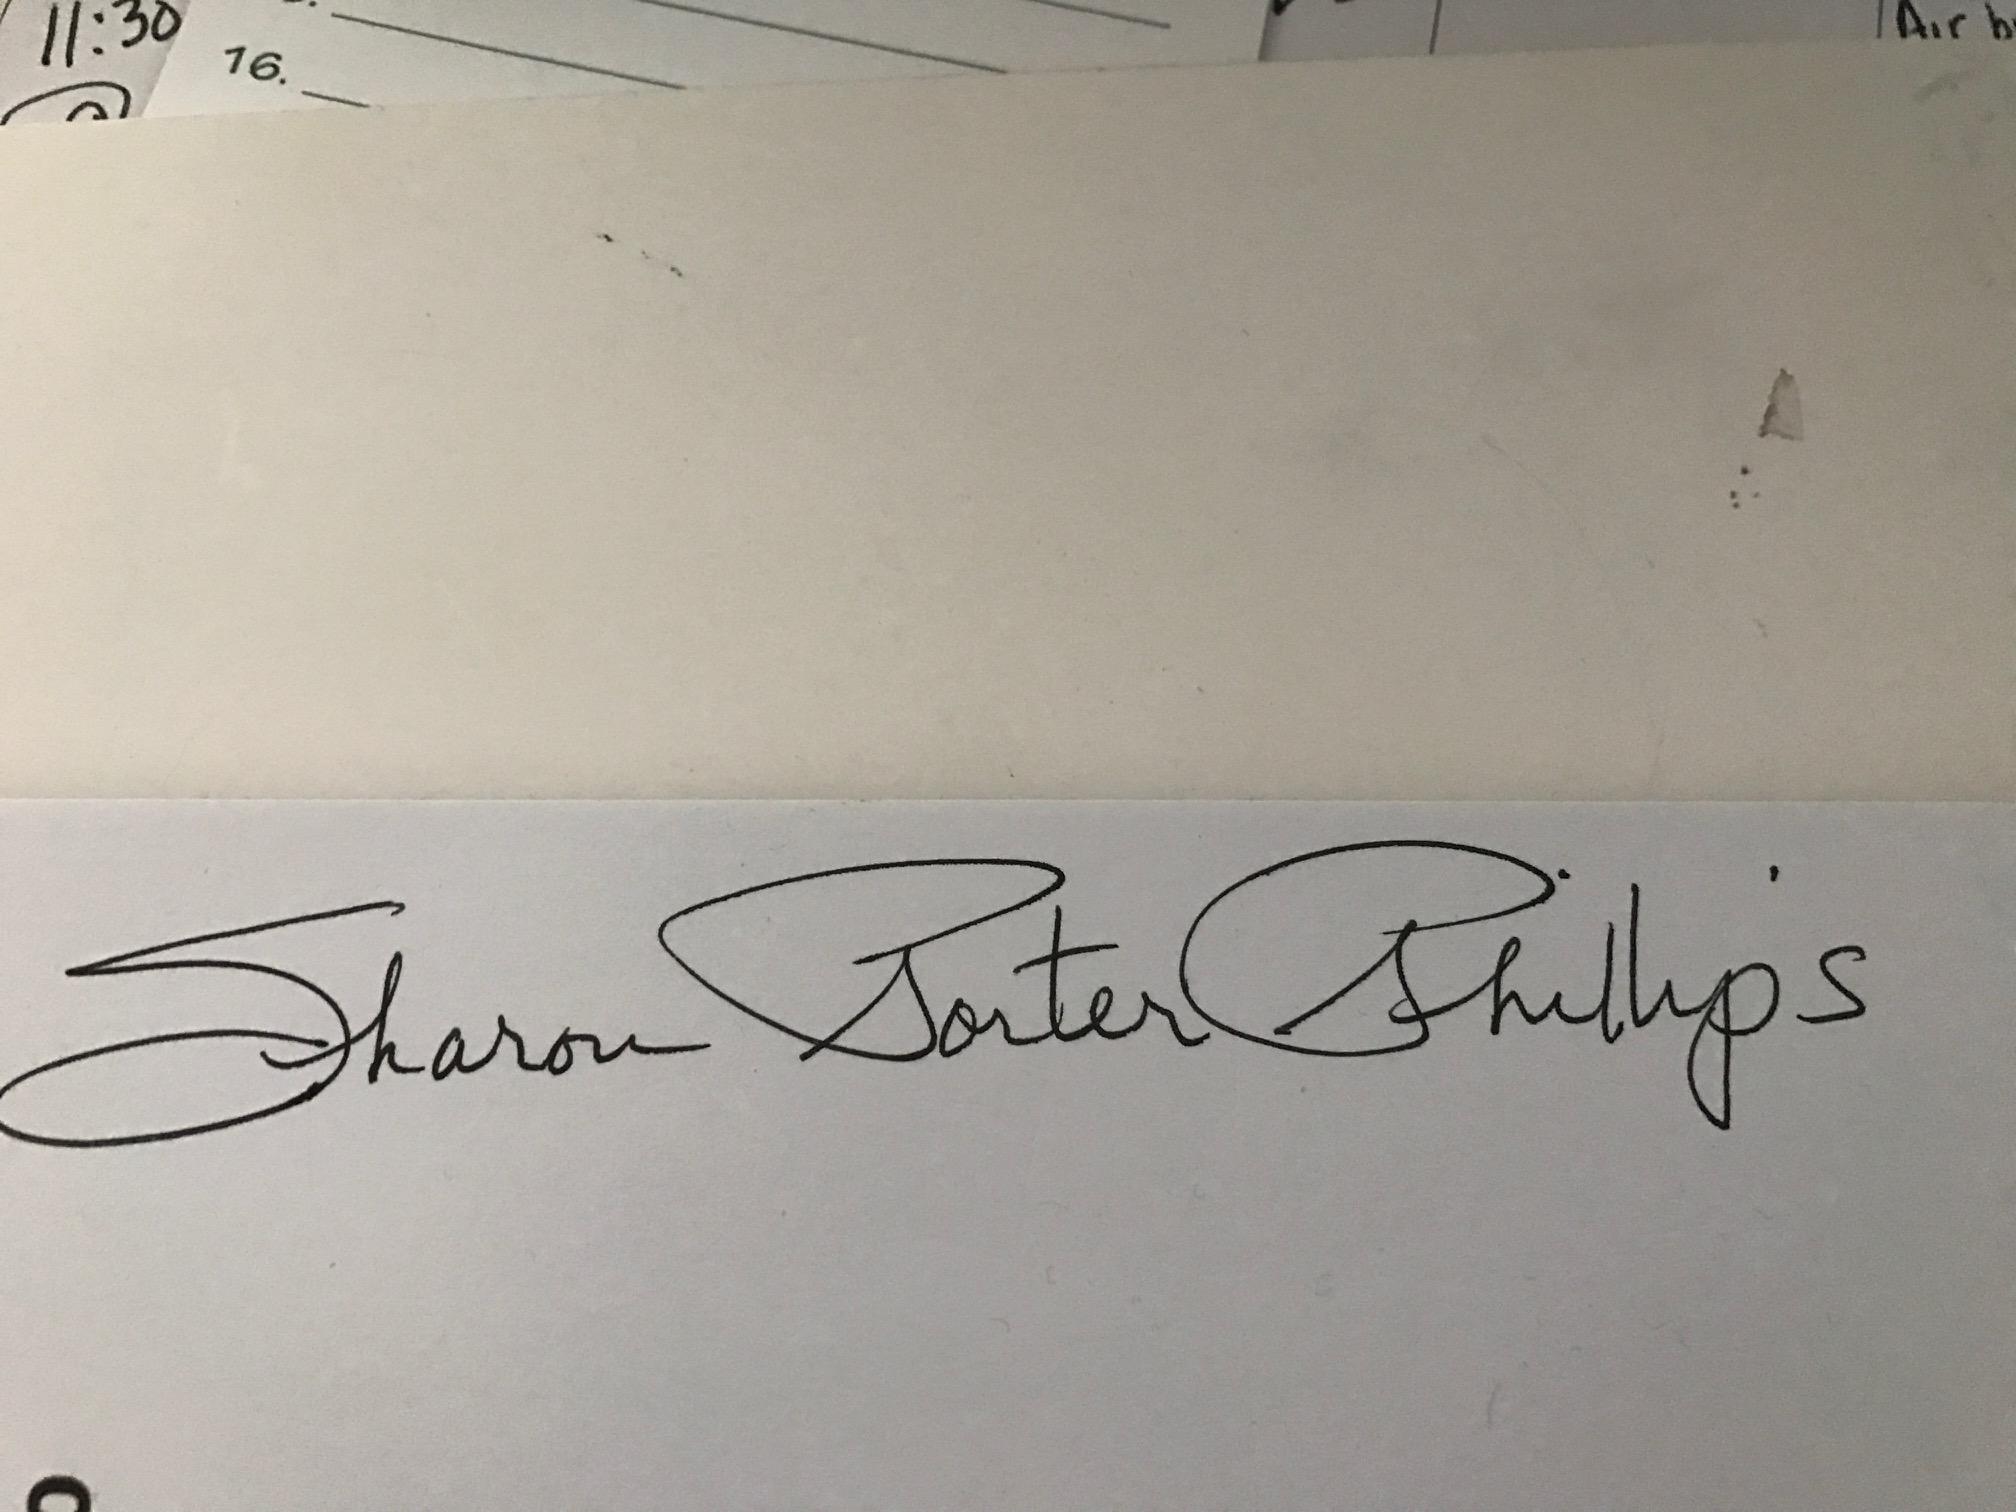 bigread's Signature